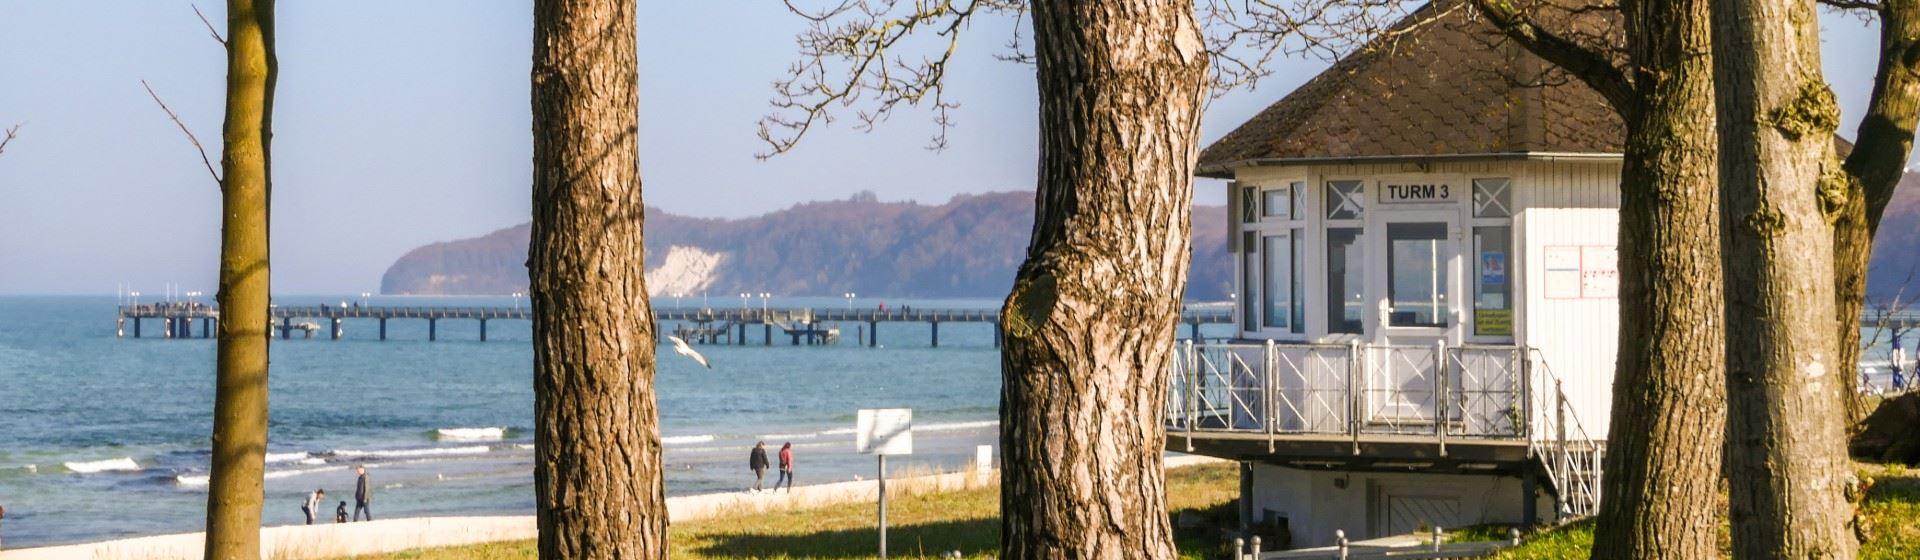 Rügen - Duitslands grootste eiland.